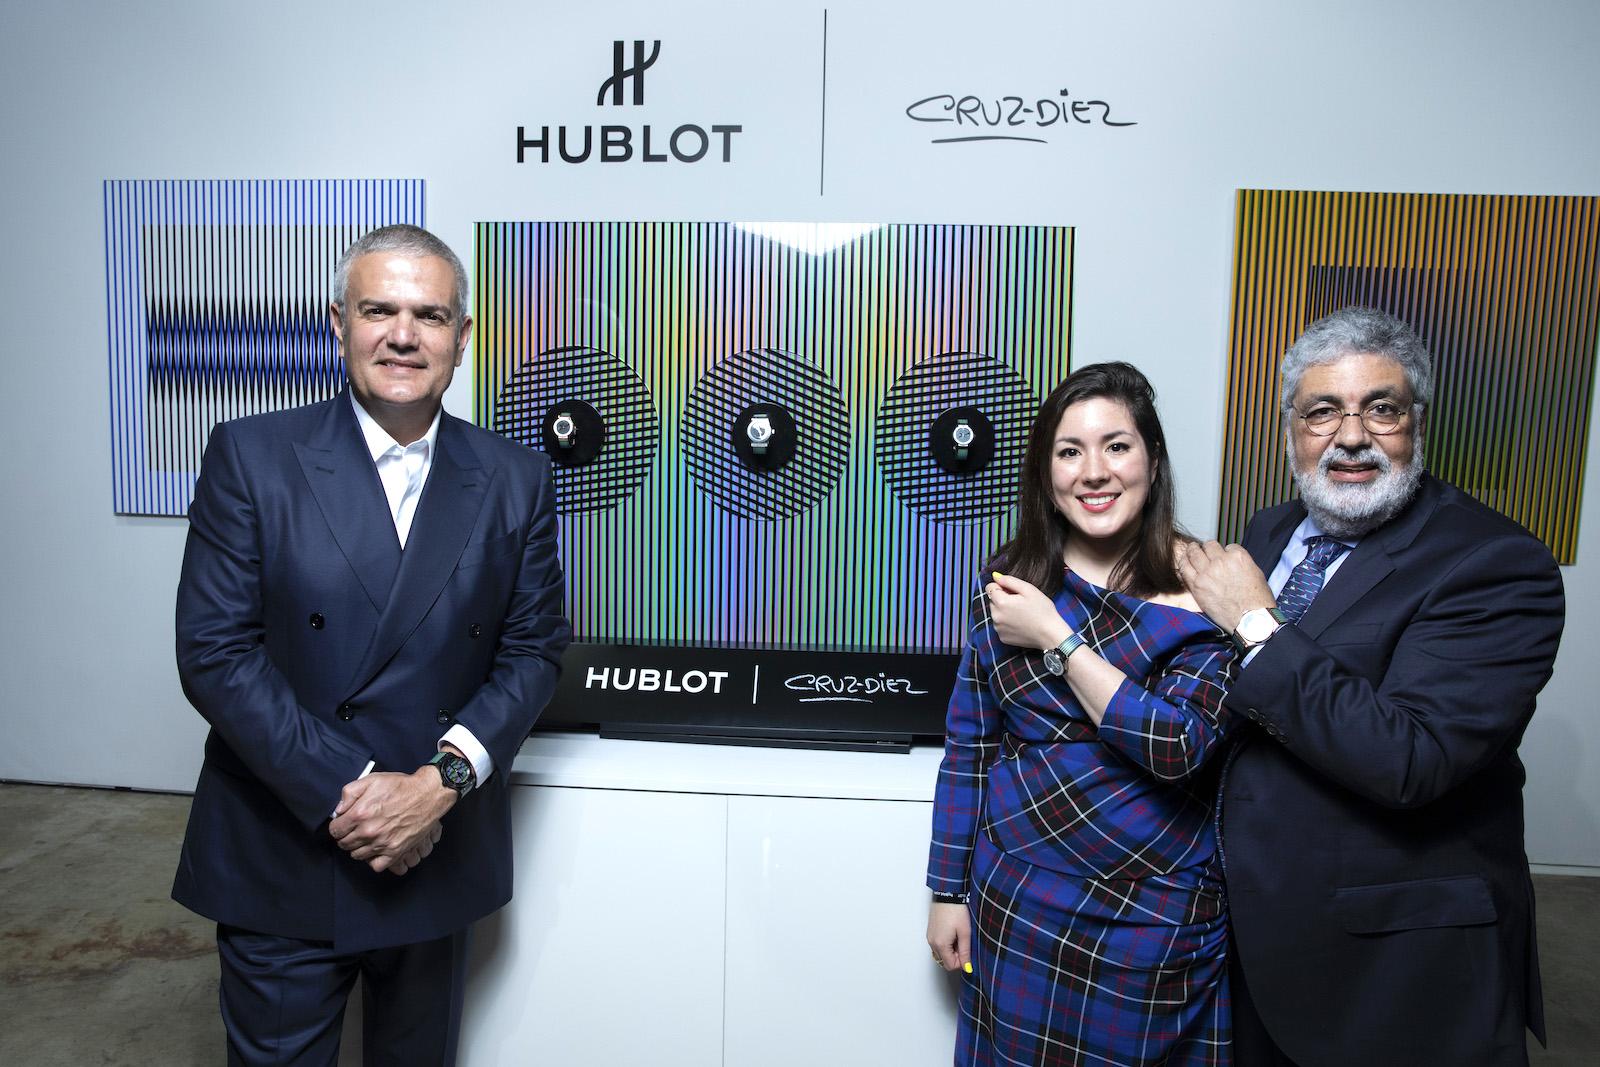 Hublot Classic Fusion Cruz-Diez - artista